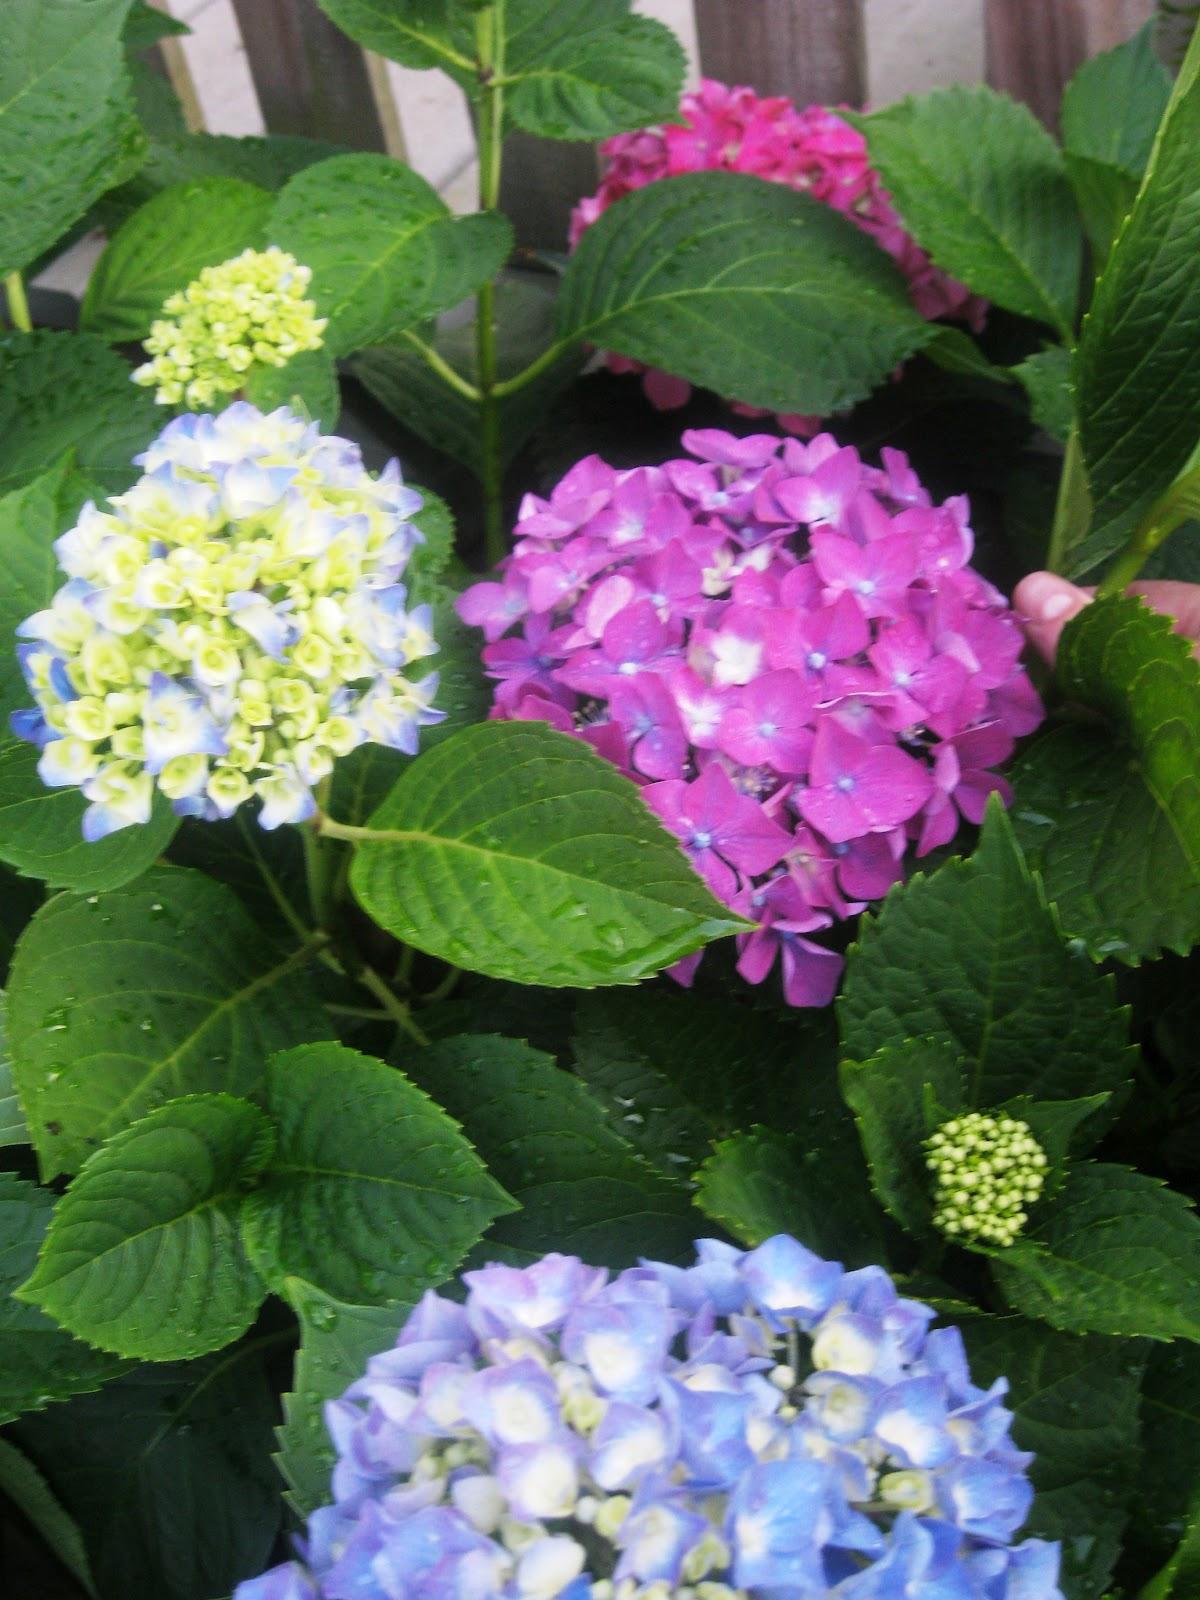 Tip Garden Thrifty Gardening How To Root Hydrangeas From